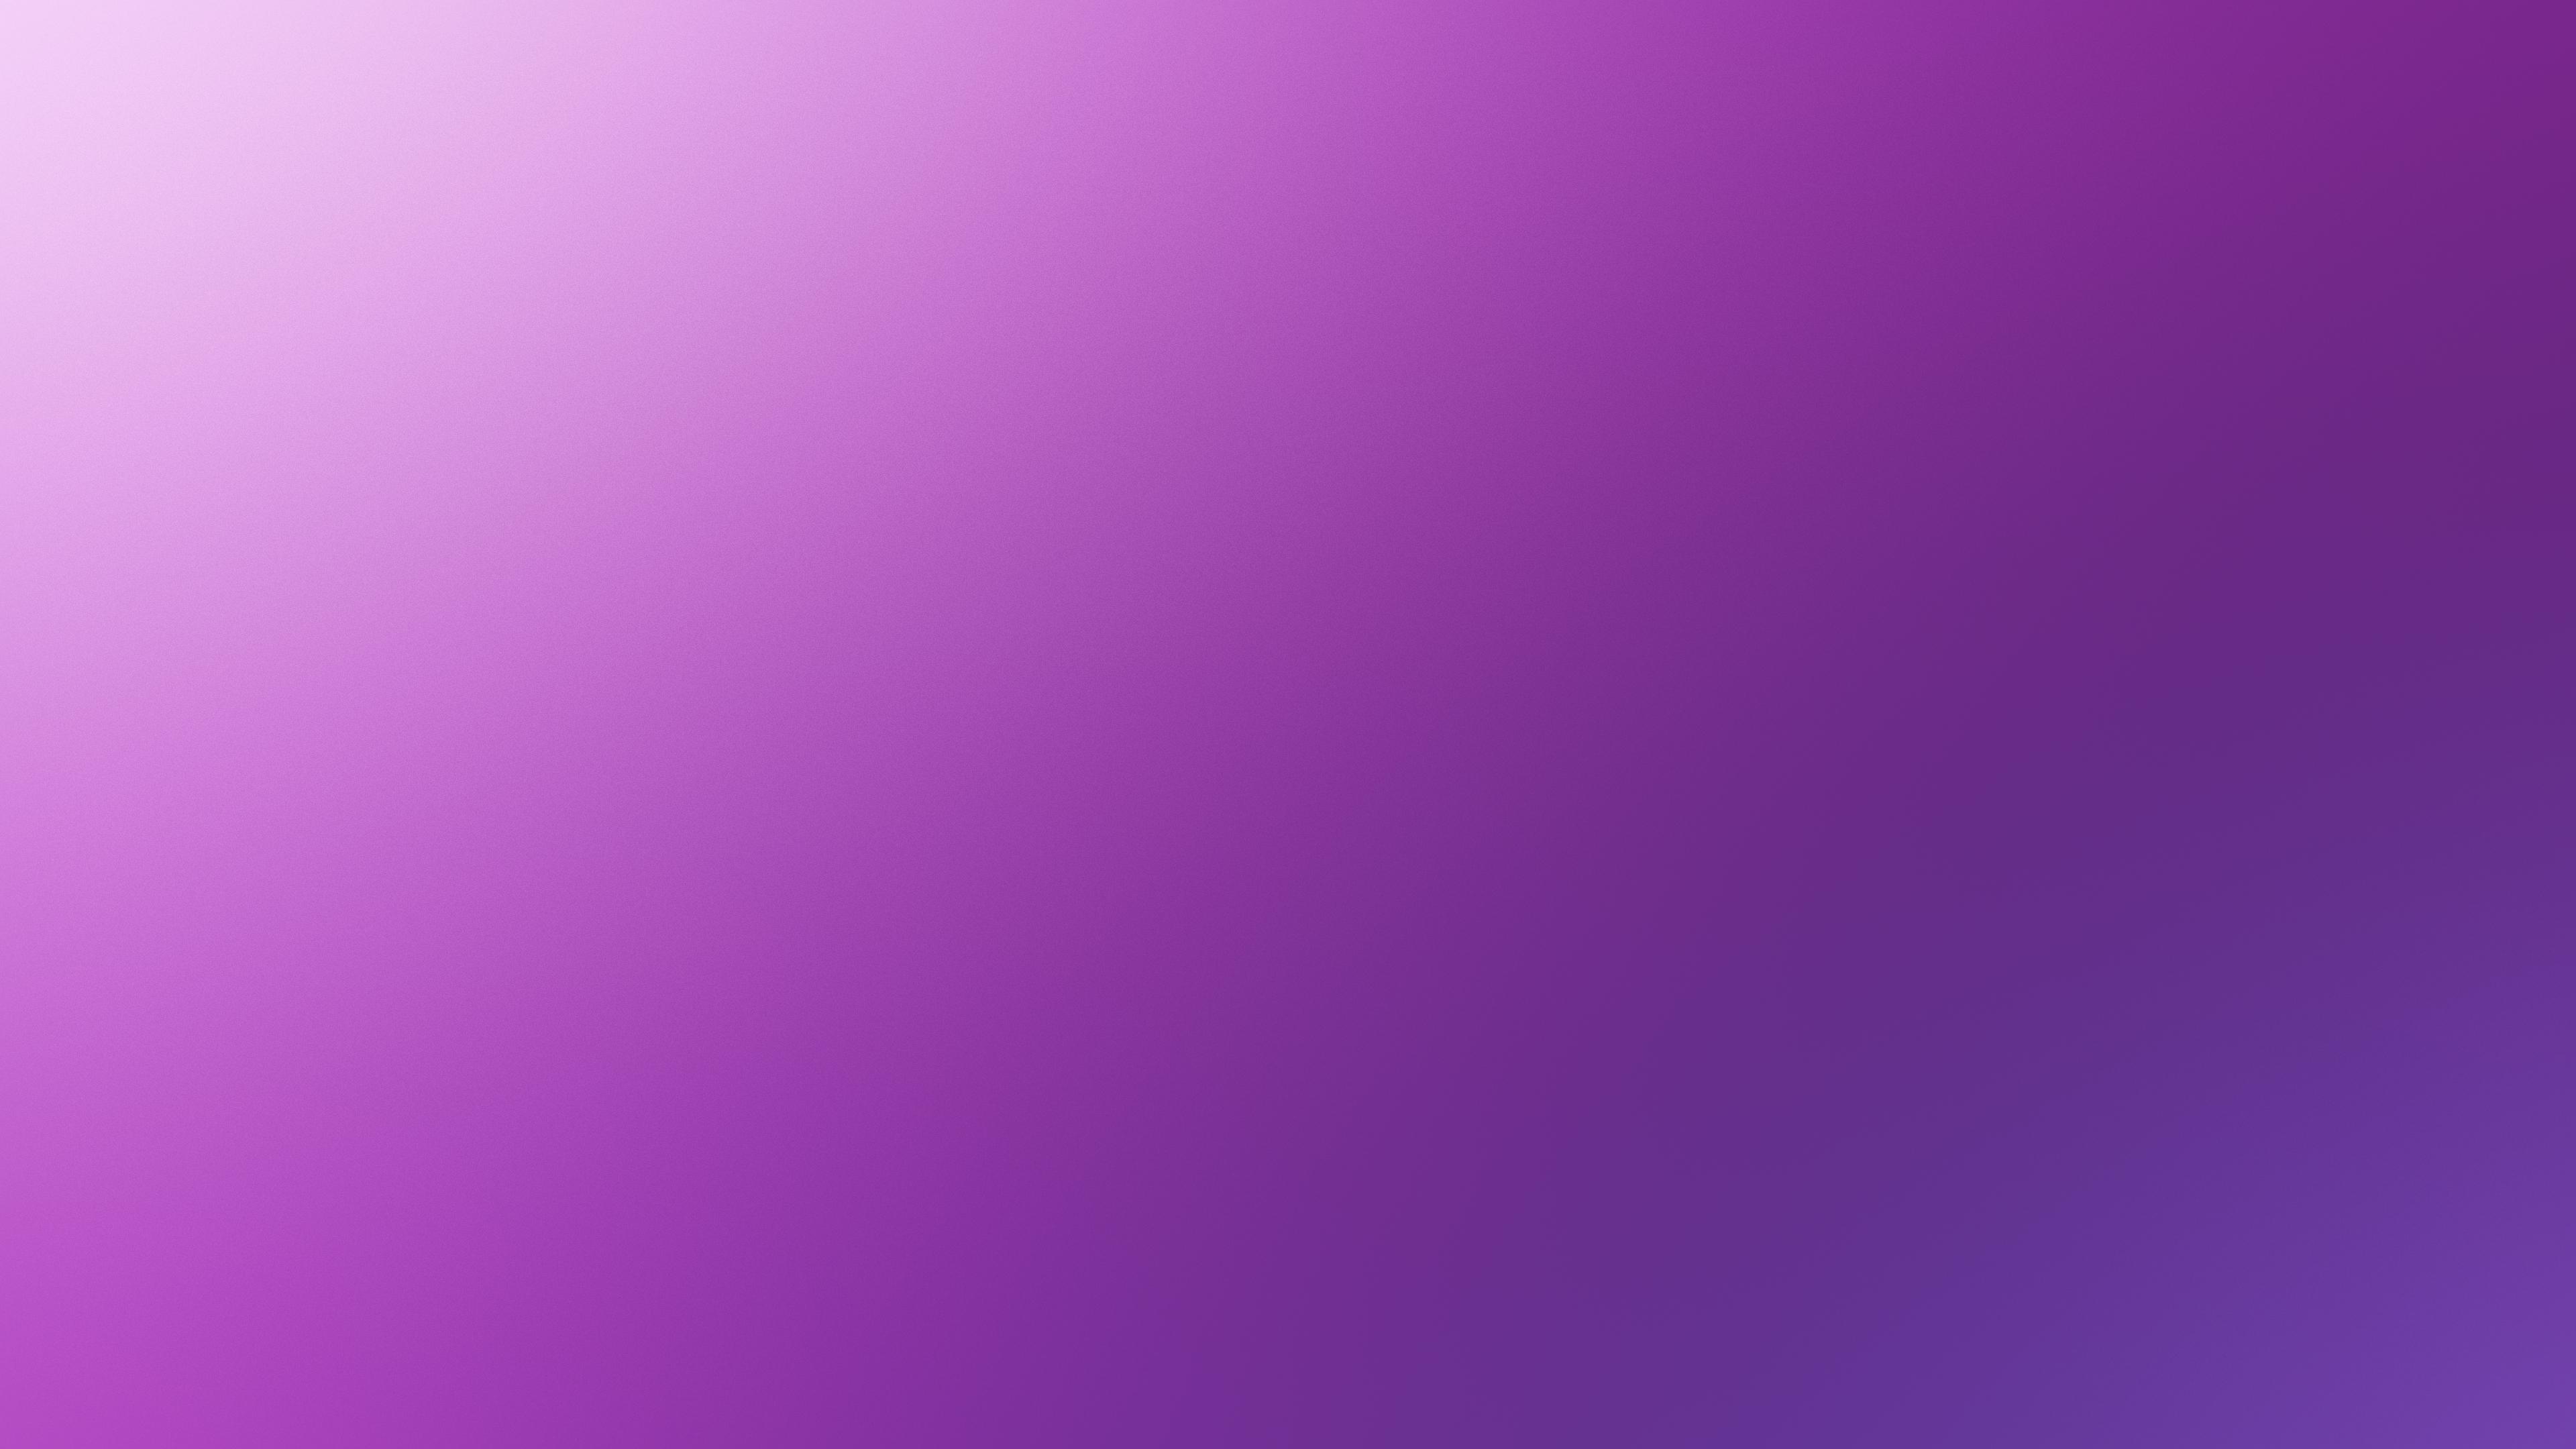 space purple light blur minimalism 4k 1540752893 - Space Purple Light Blur Minimalism 4k - purple wallpapers, minimalism wallpapers, hd-wallpapers, gradient wallpapers, digital art wallpapers, deviantart wallpapers, blur wallpapers, artwork wallpapers, artist wallpapers, 4k-wallpapers